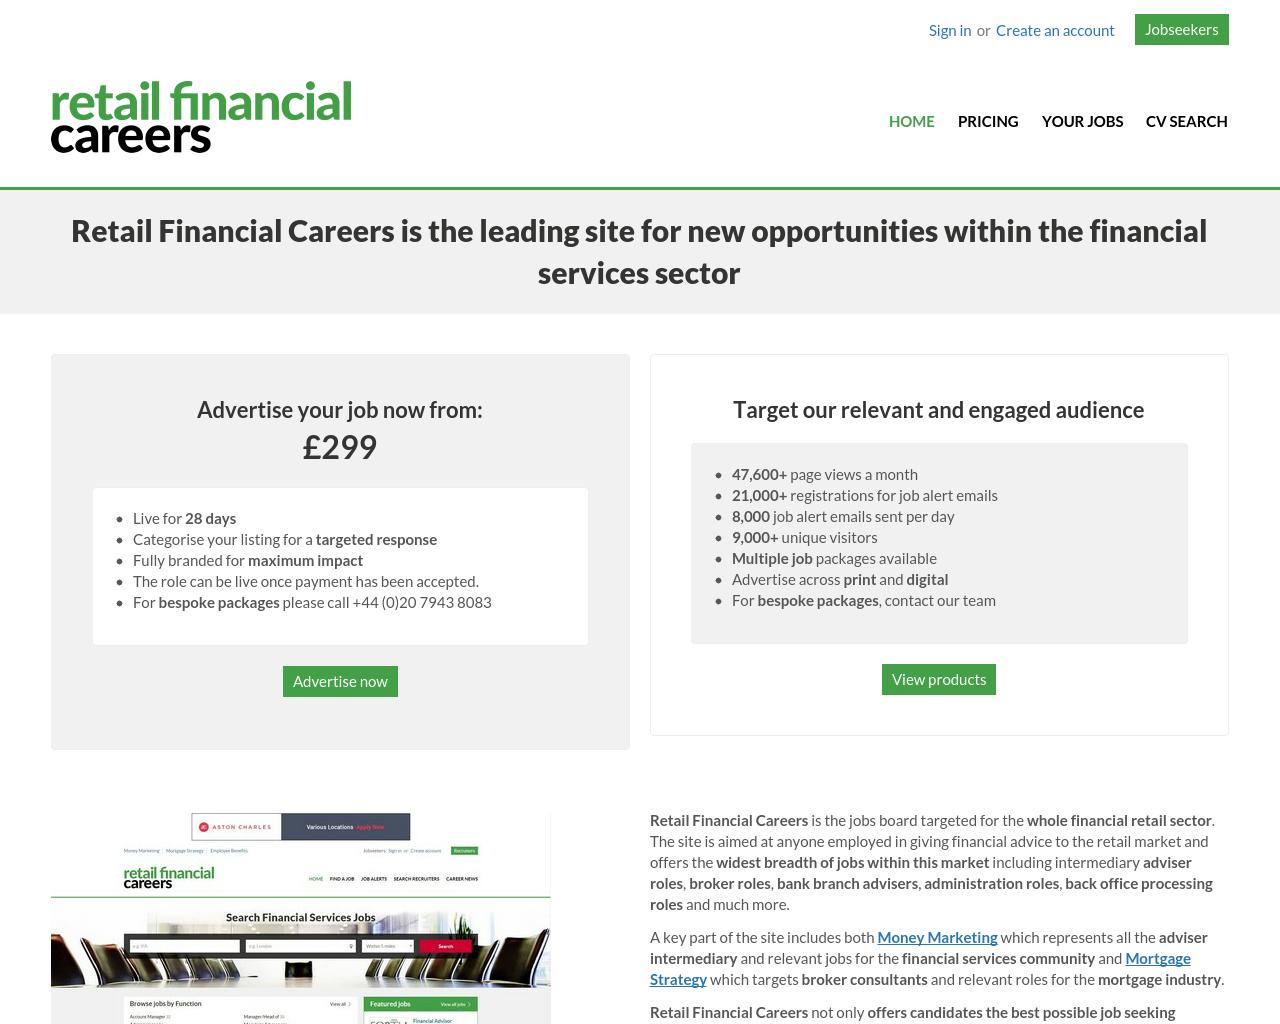 Retail-Financial-Careers-Advertising-Reviews-Pricing